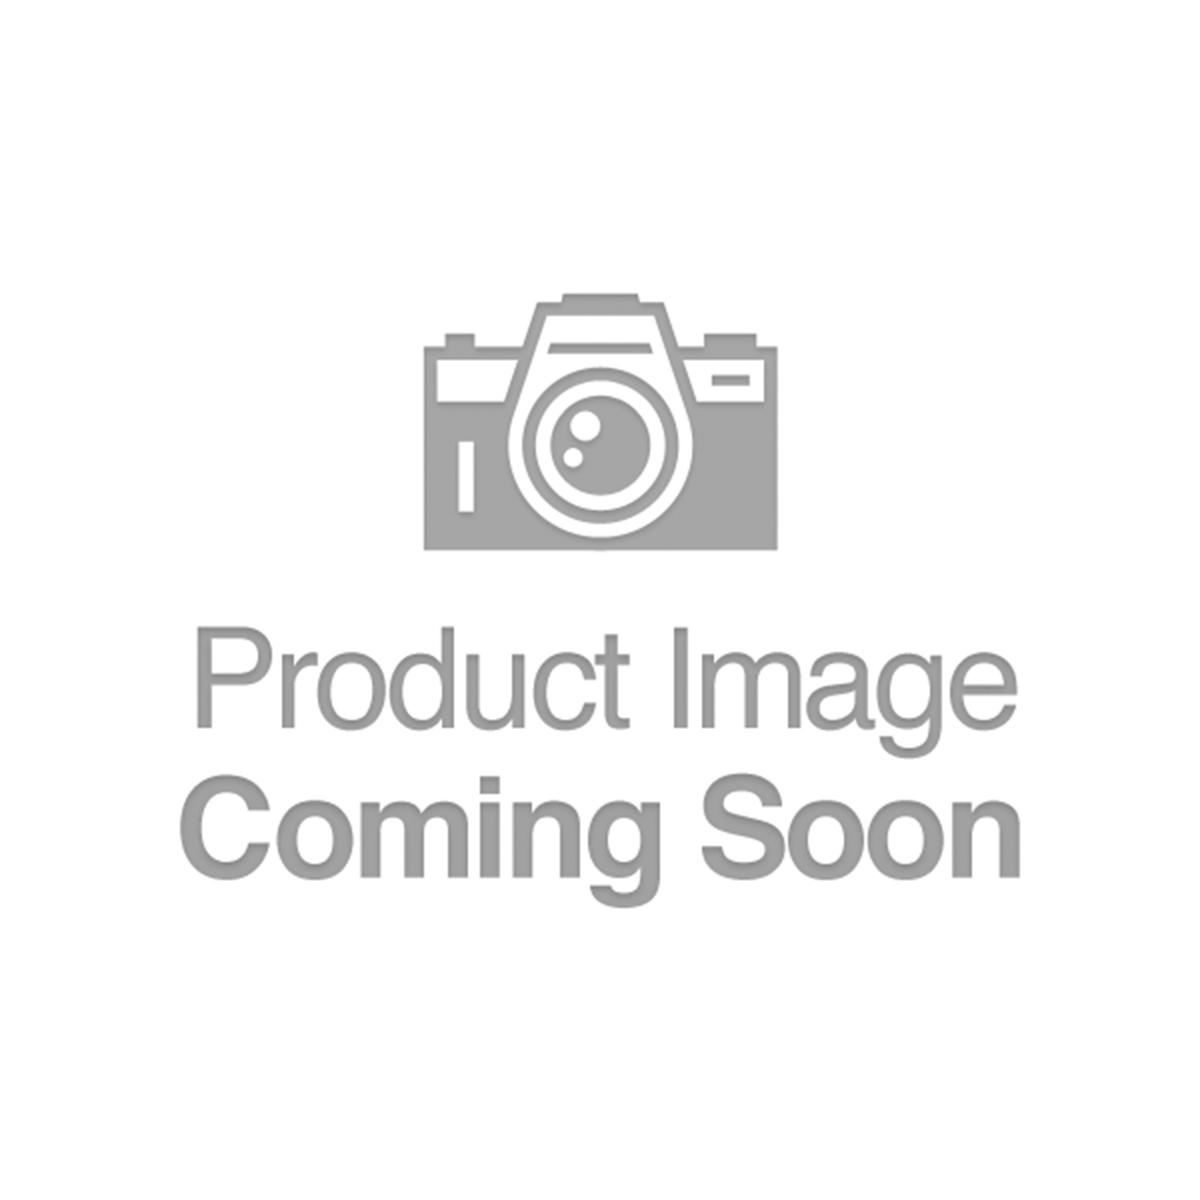 Mpc Series 481 1 Pmg 66epq Military Payment Certs Mpc